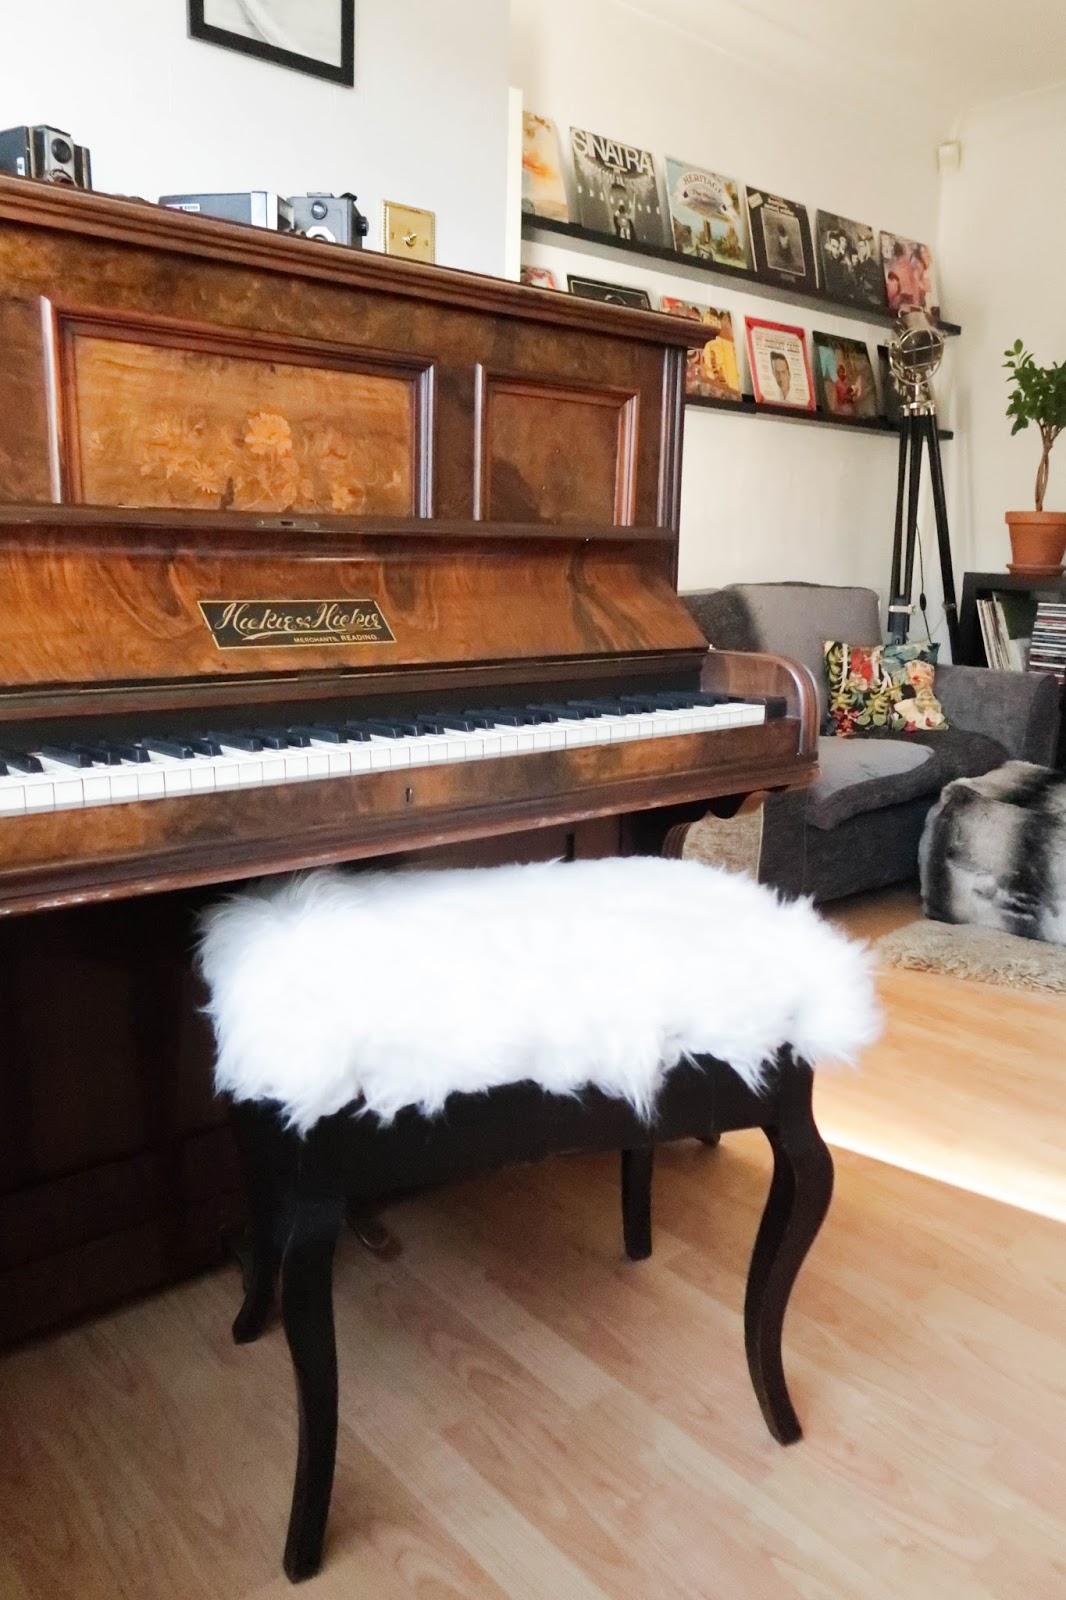 Upcycled piano stool DIY